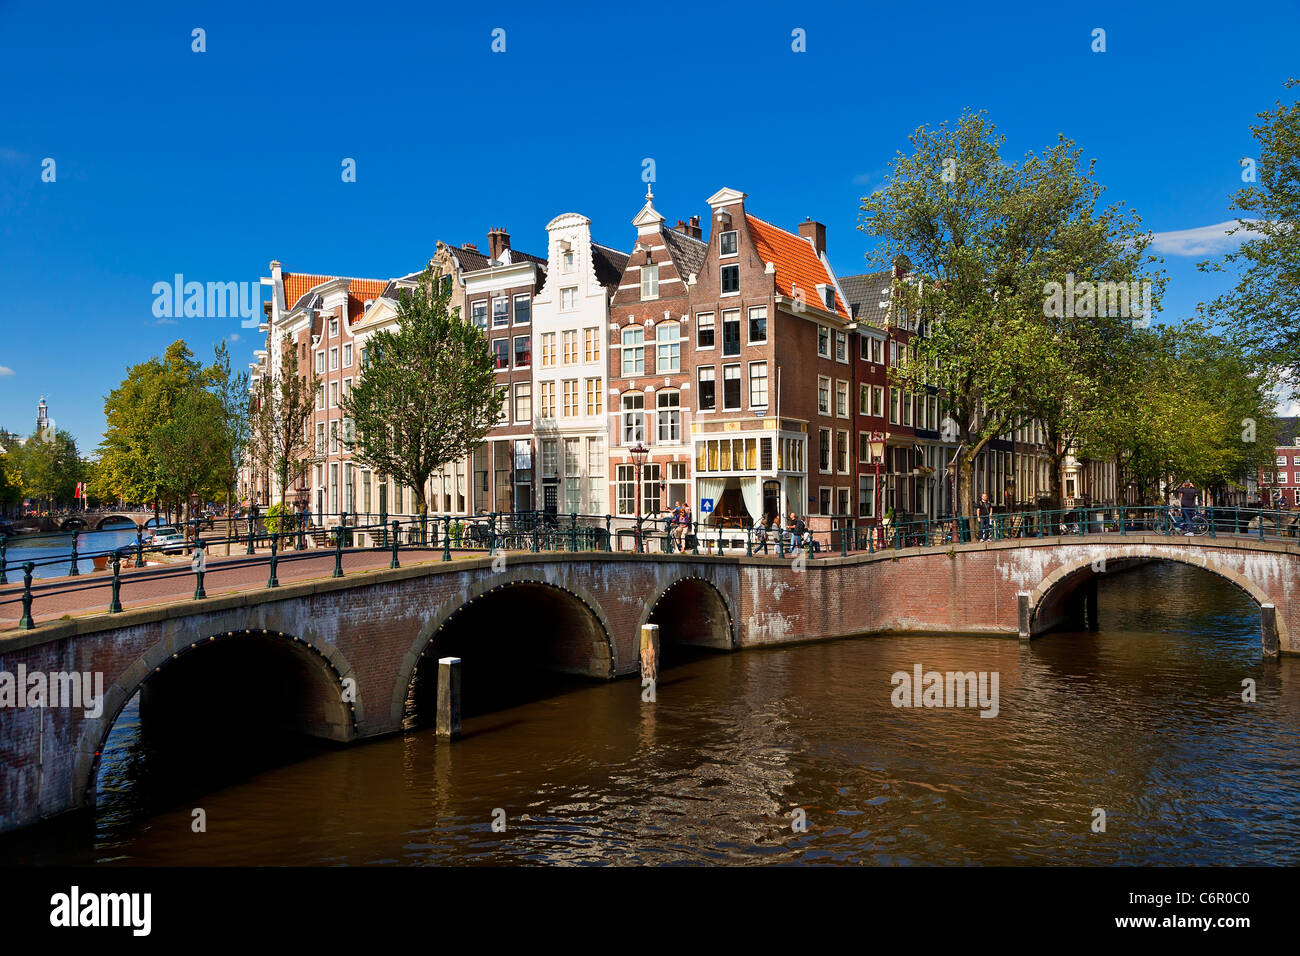 Europa, Paesi Bassi, canale Keizersgracht in Amsterdam Foto Stock